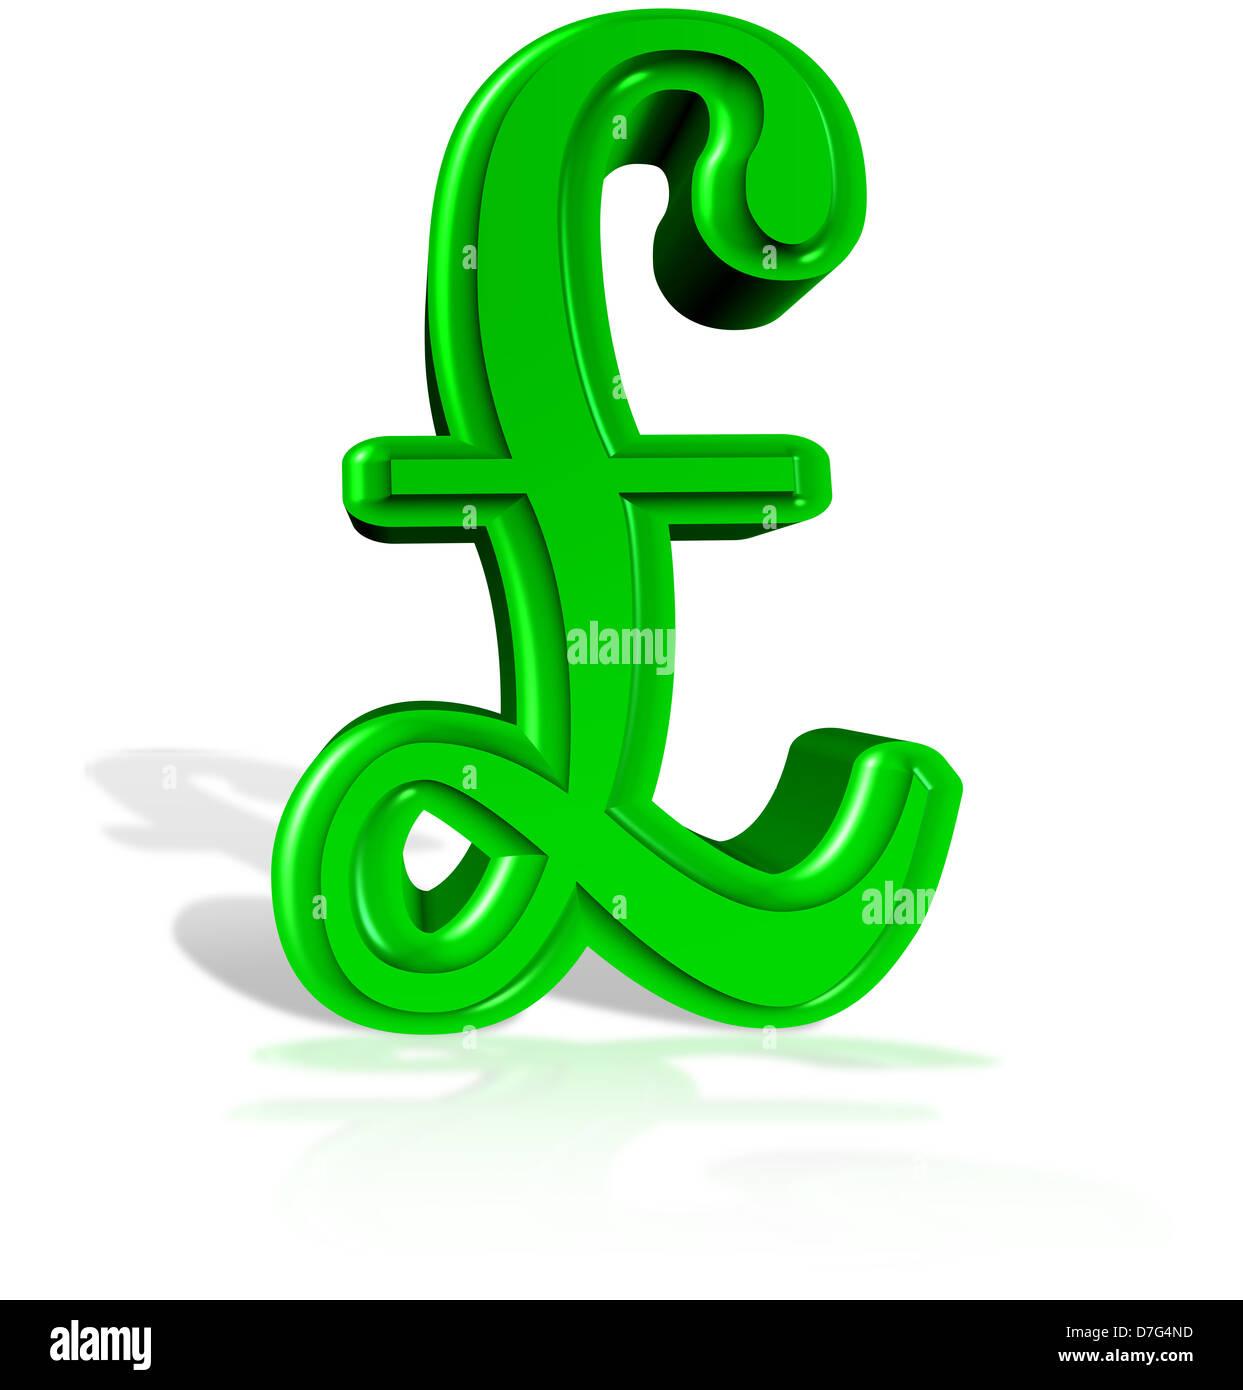 British Pound Sign Stock Photos British Pound Sign Stock Images